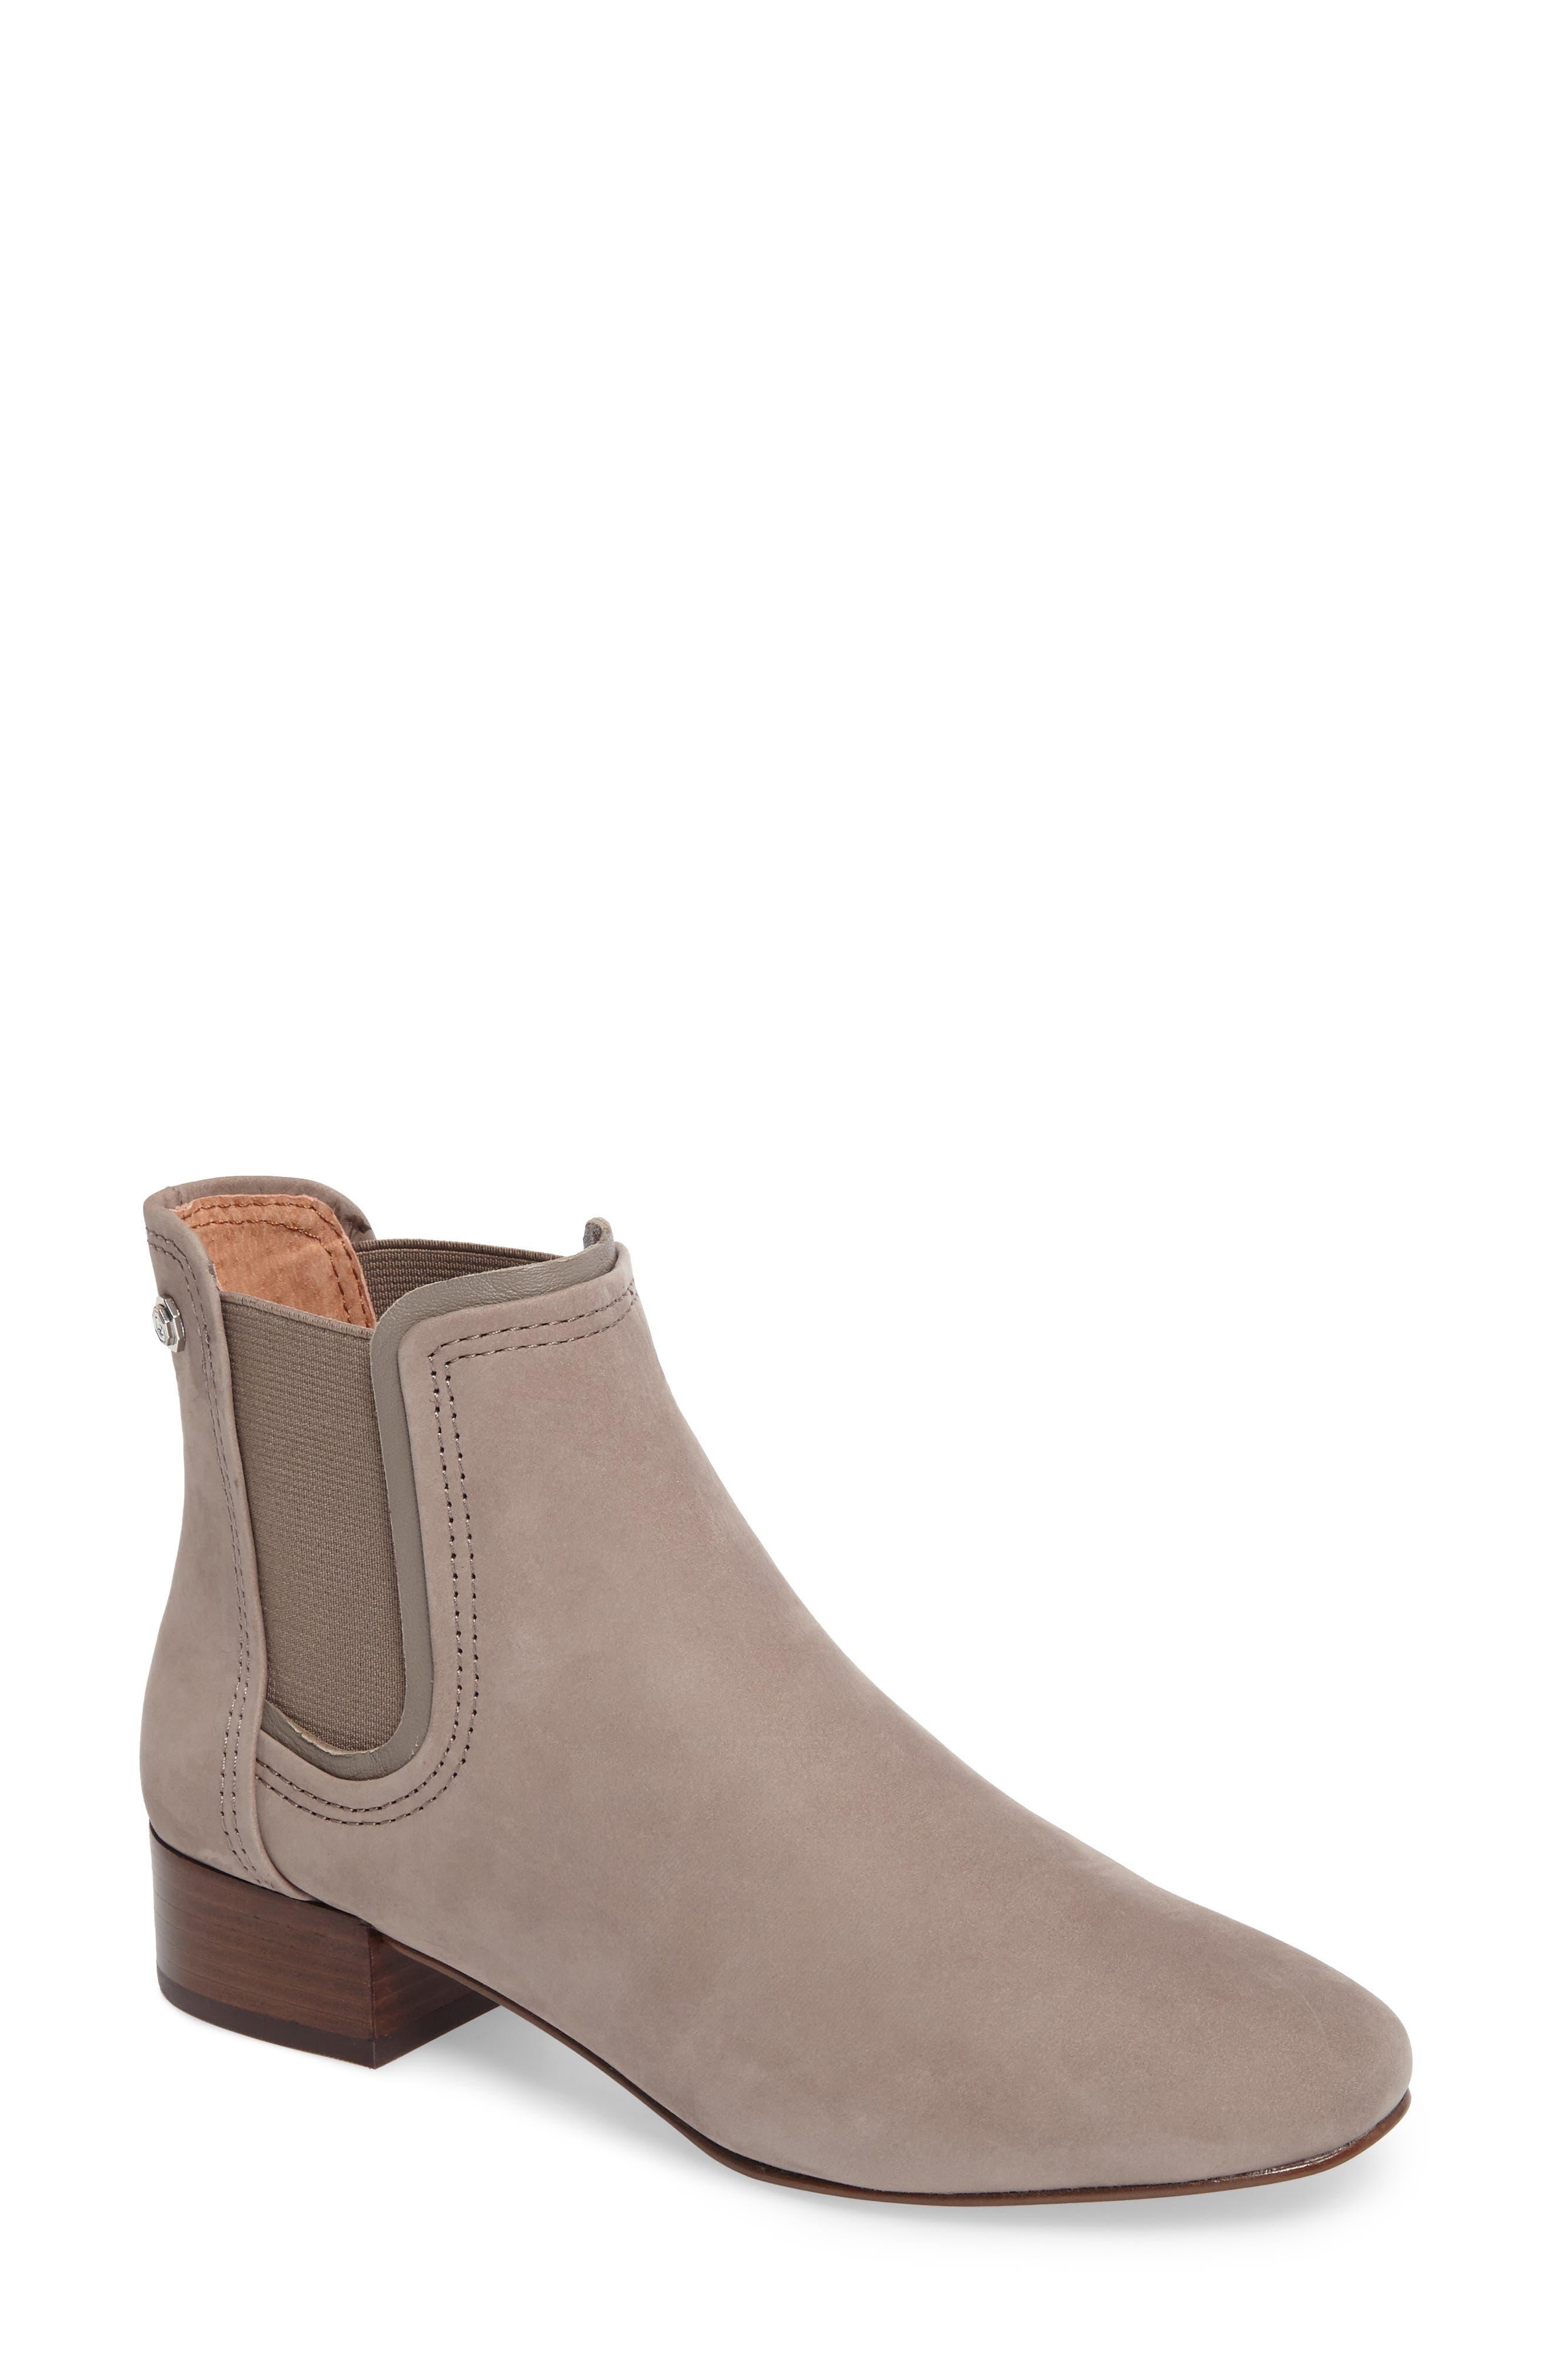 Waldon Chelsea Boot,                             Main thumbnail 1, color,                             Gravel Leather